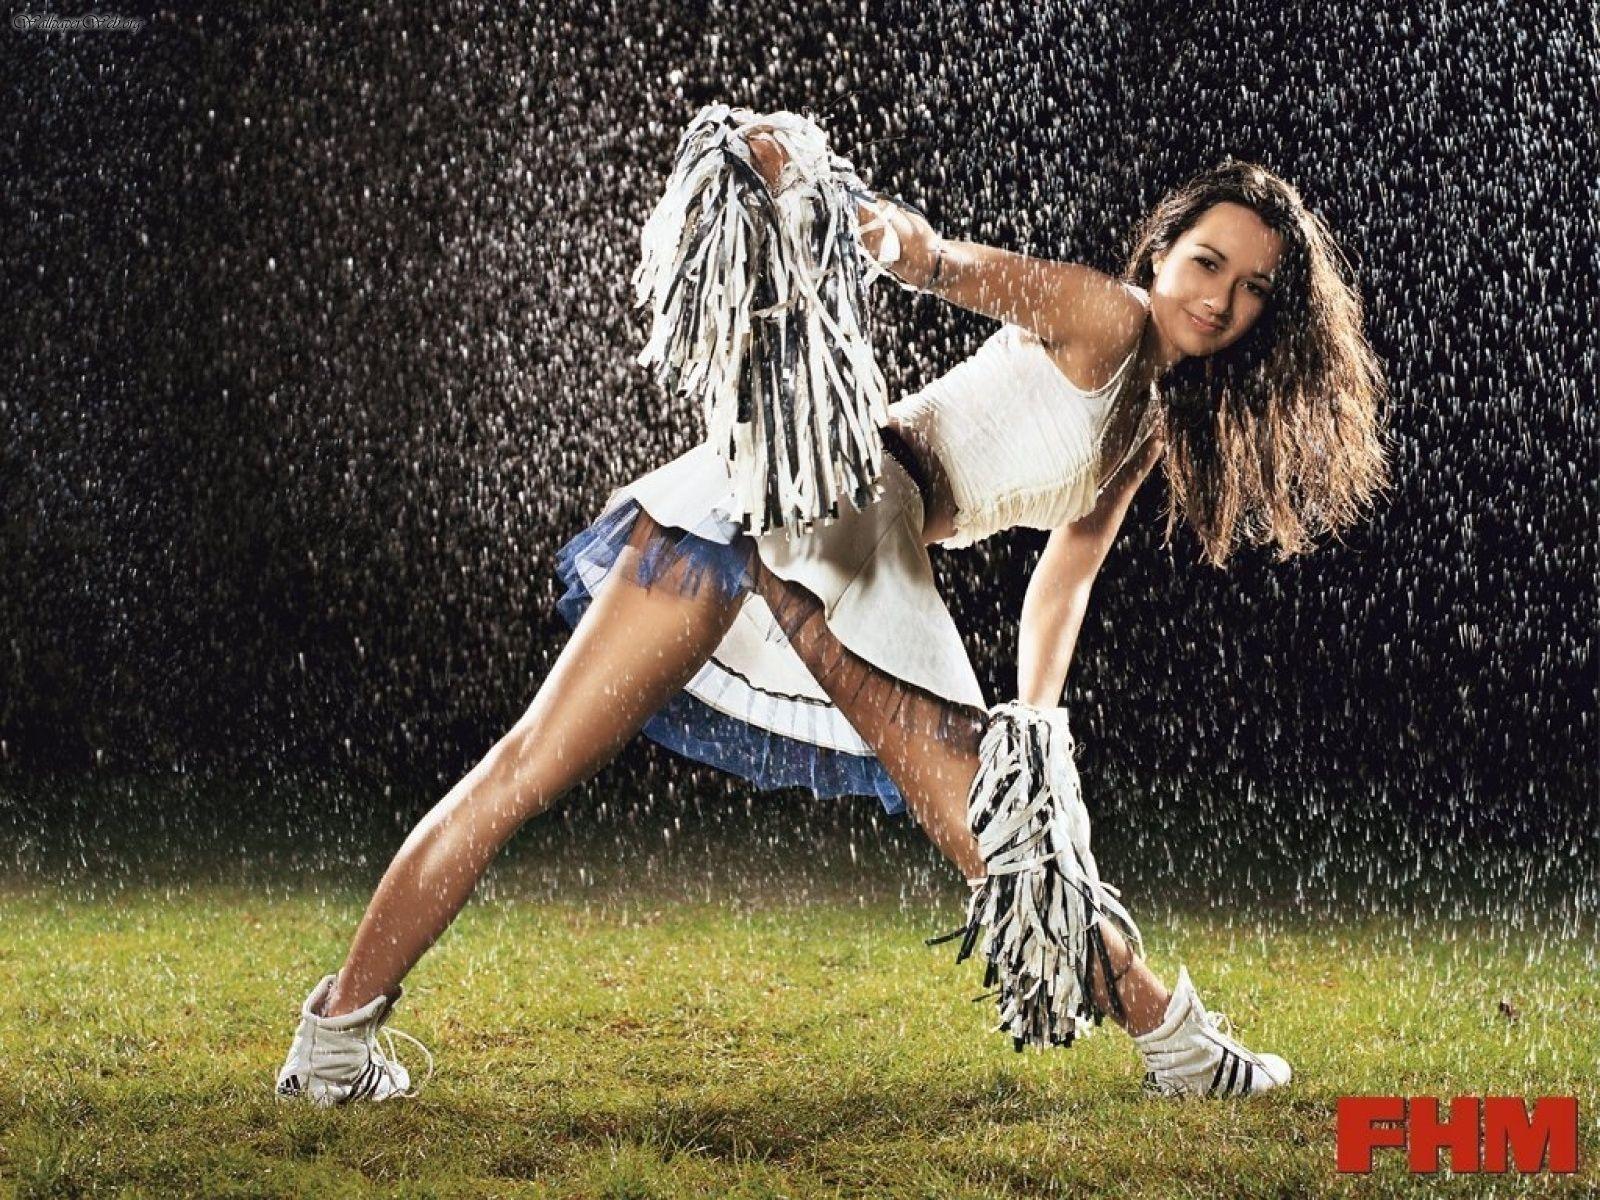 wwwwallpaperweborgwallpaperBabes1600x1200FHM  Cheerleaderjpg 1600x1200